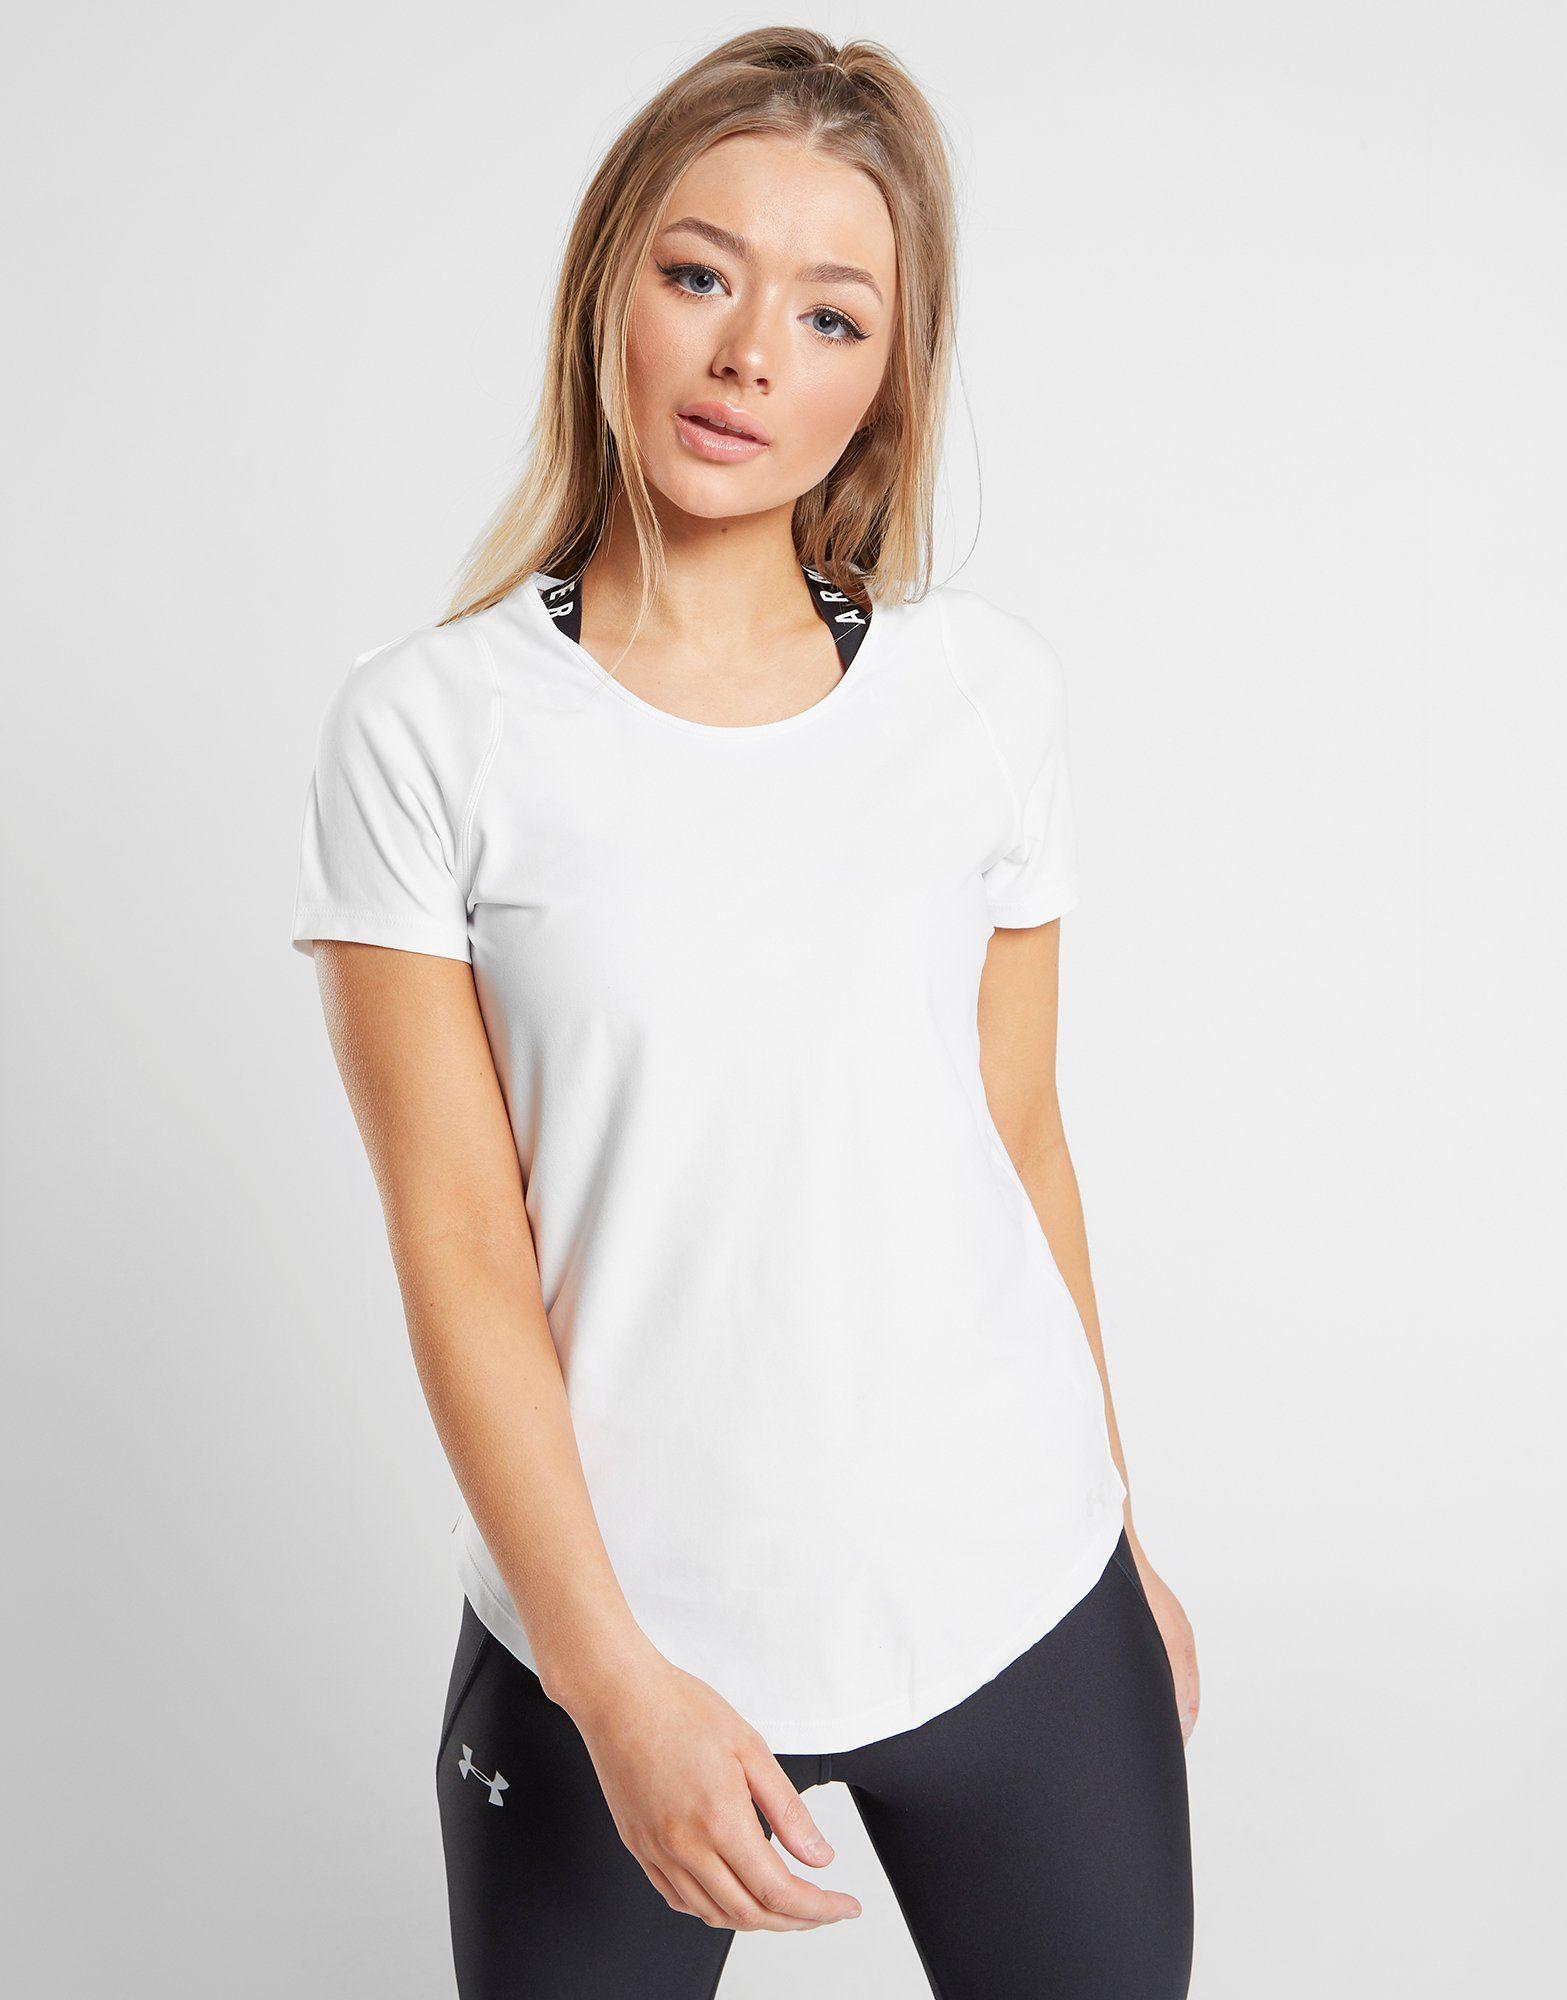 Under Armour Vanish Short Sleeve T-Shirt